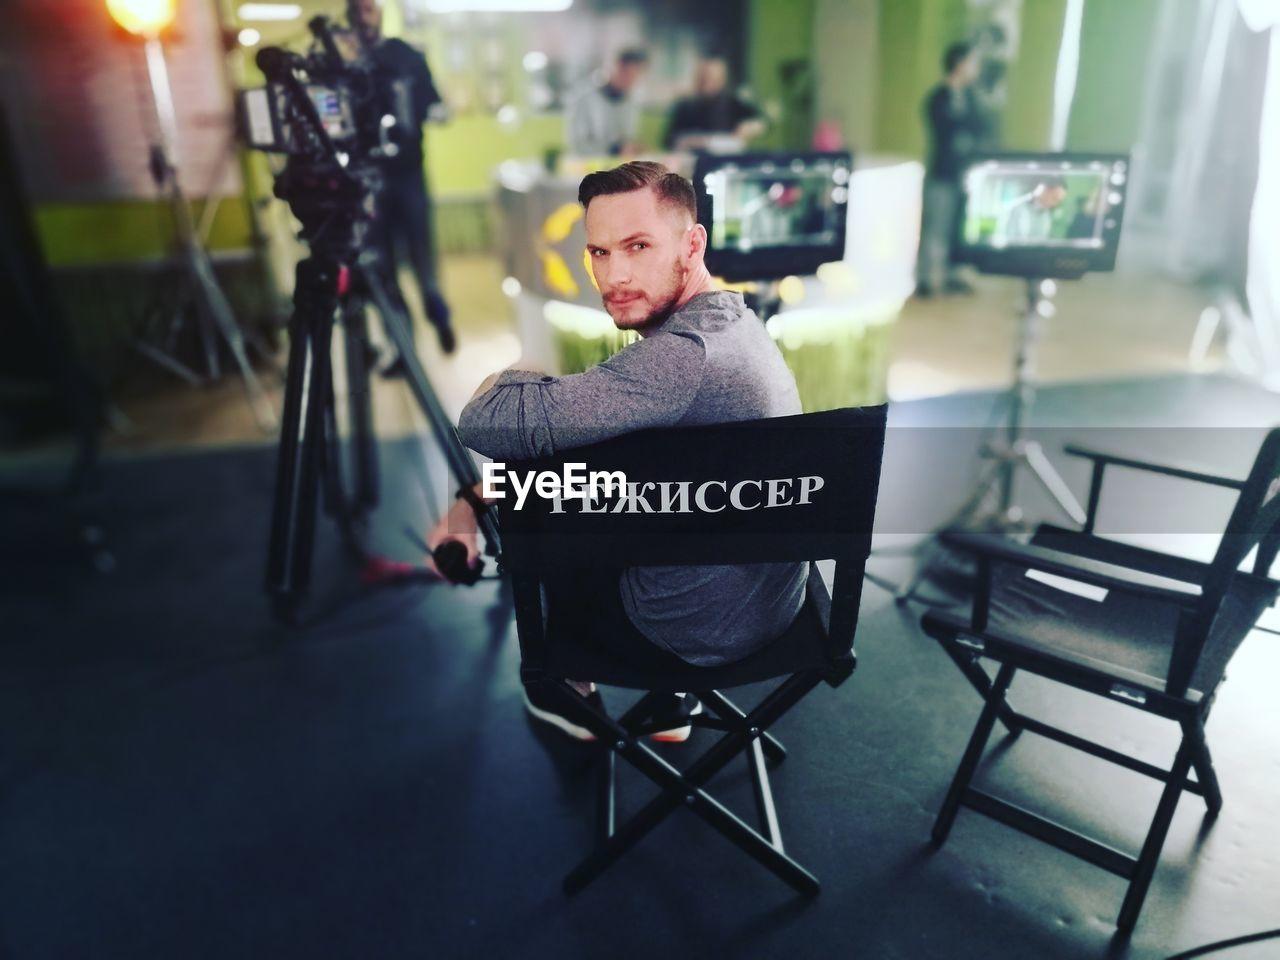 Portrait of man sitting on folding chair in studio